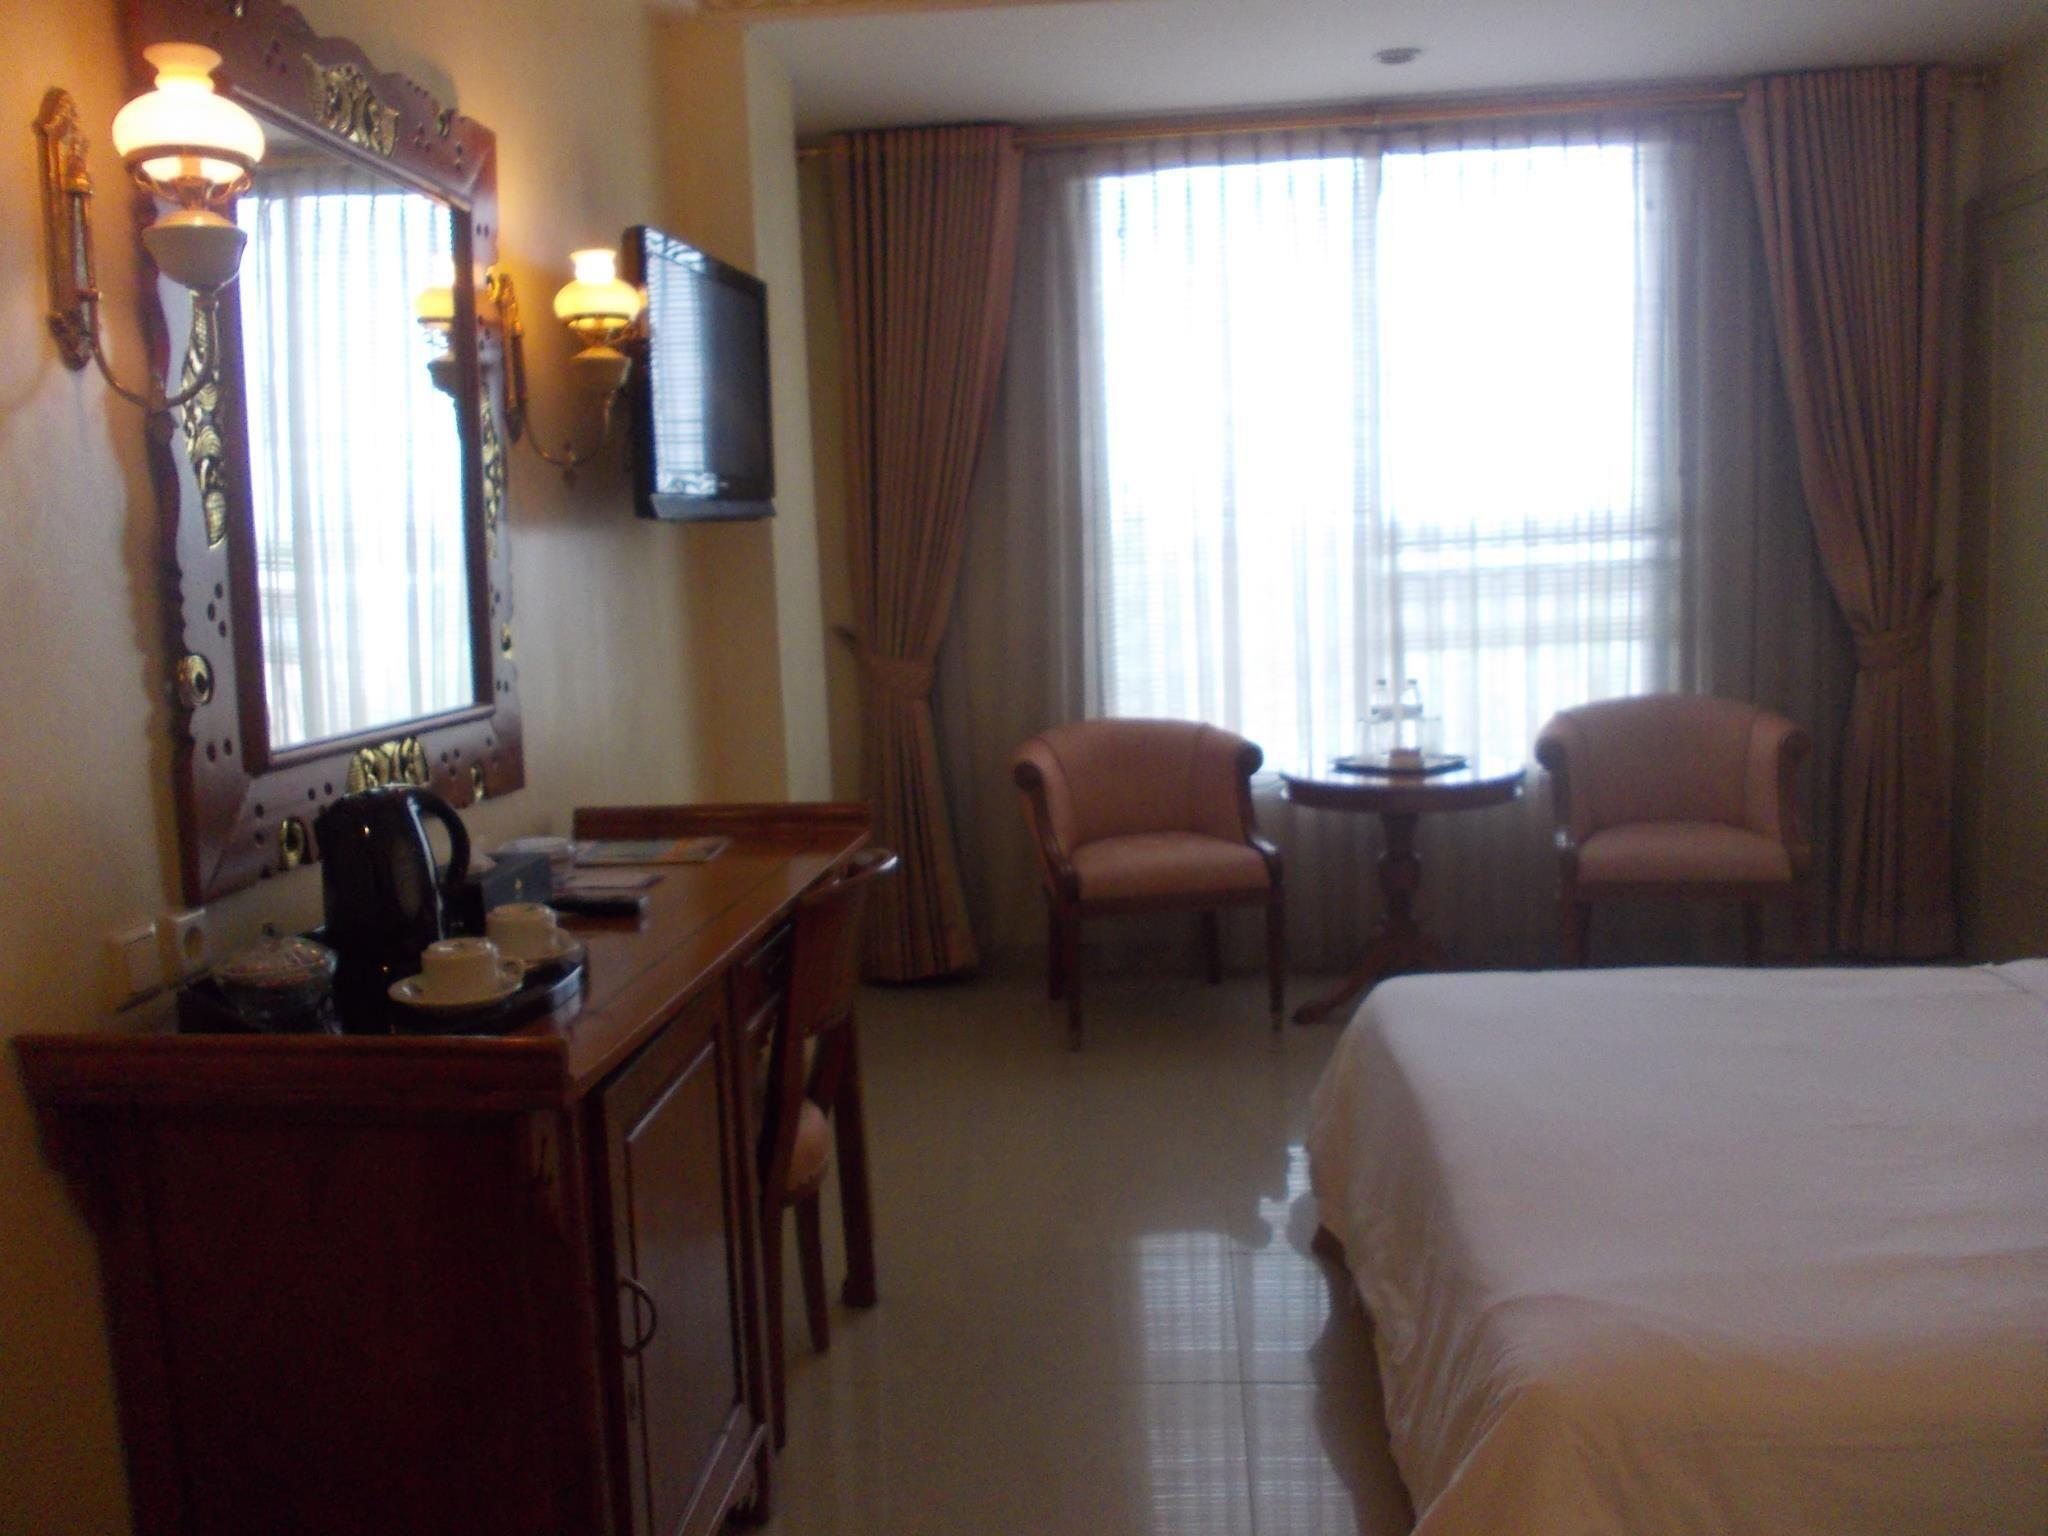 Hotel Prima Cirebon Cirebon, Indonesia Cirebon, Home